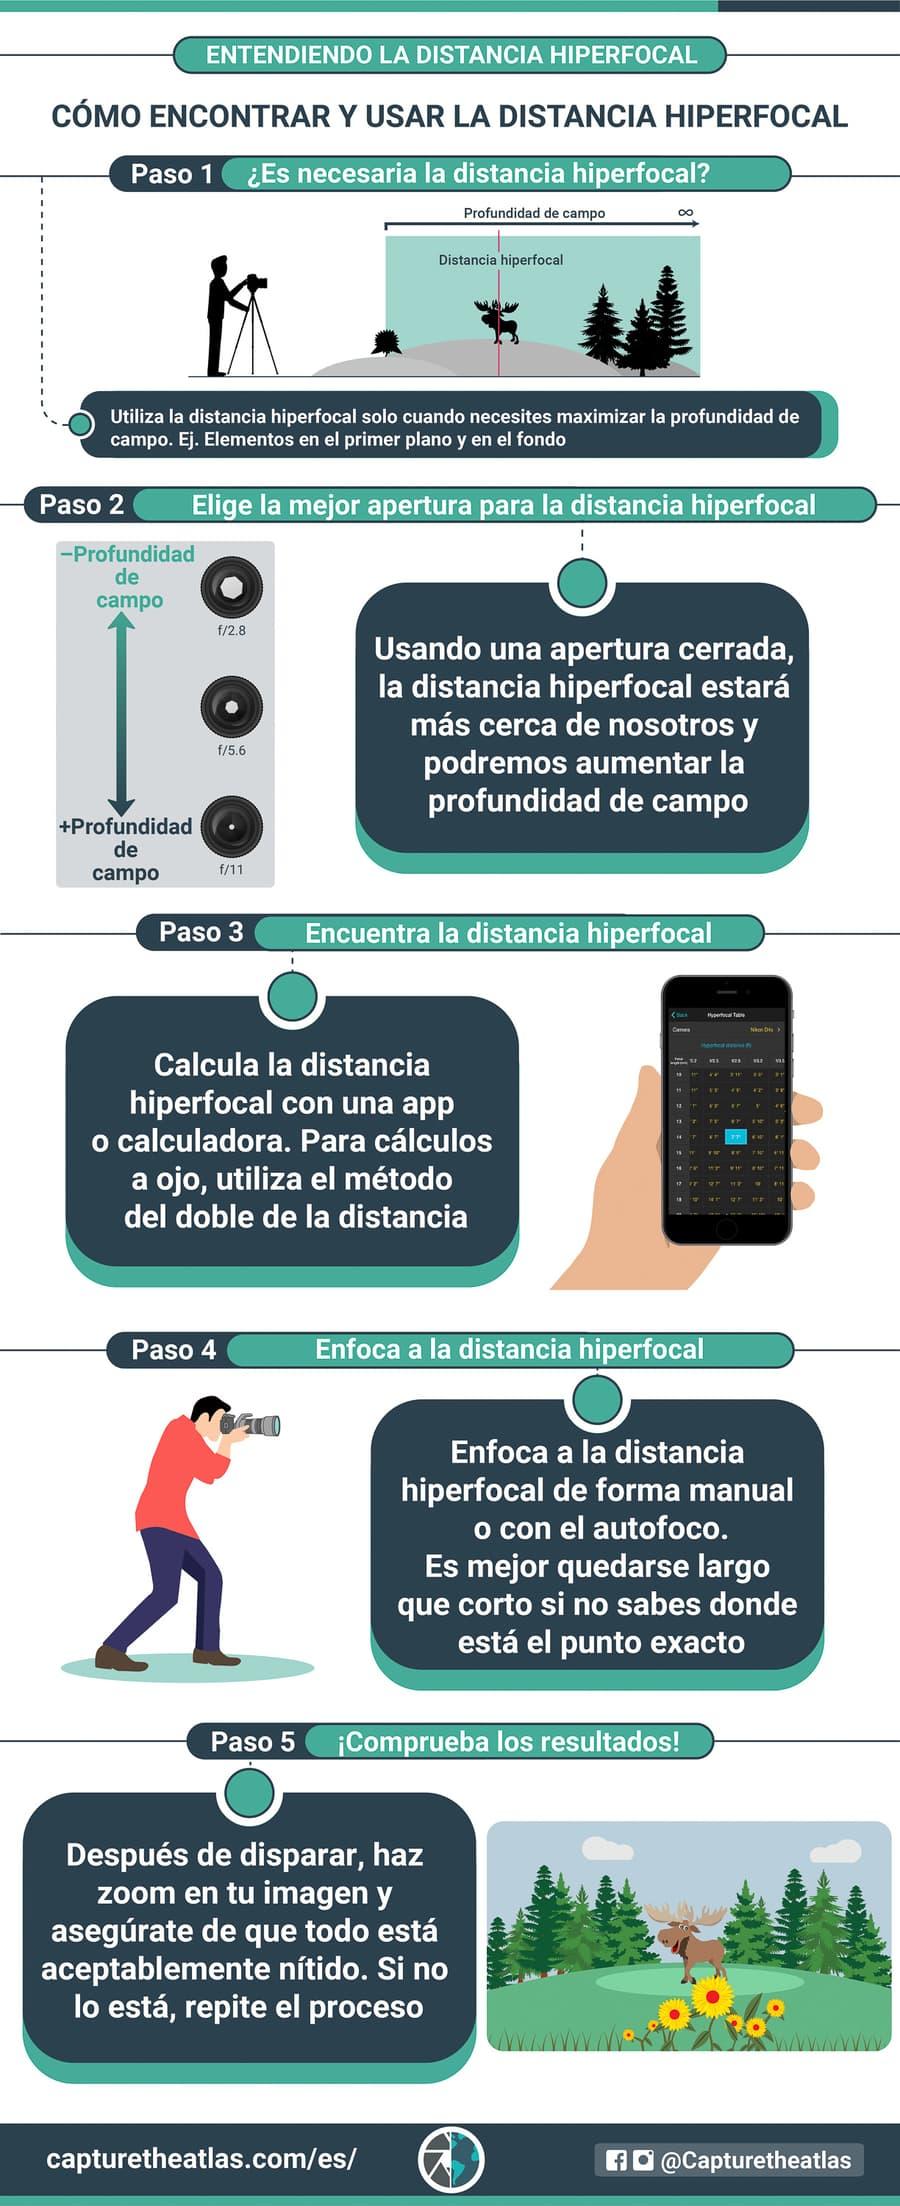 Como usar la distancia hiperfocal